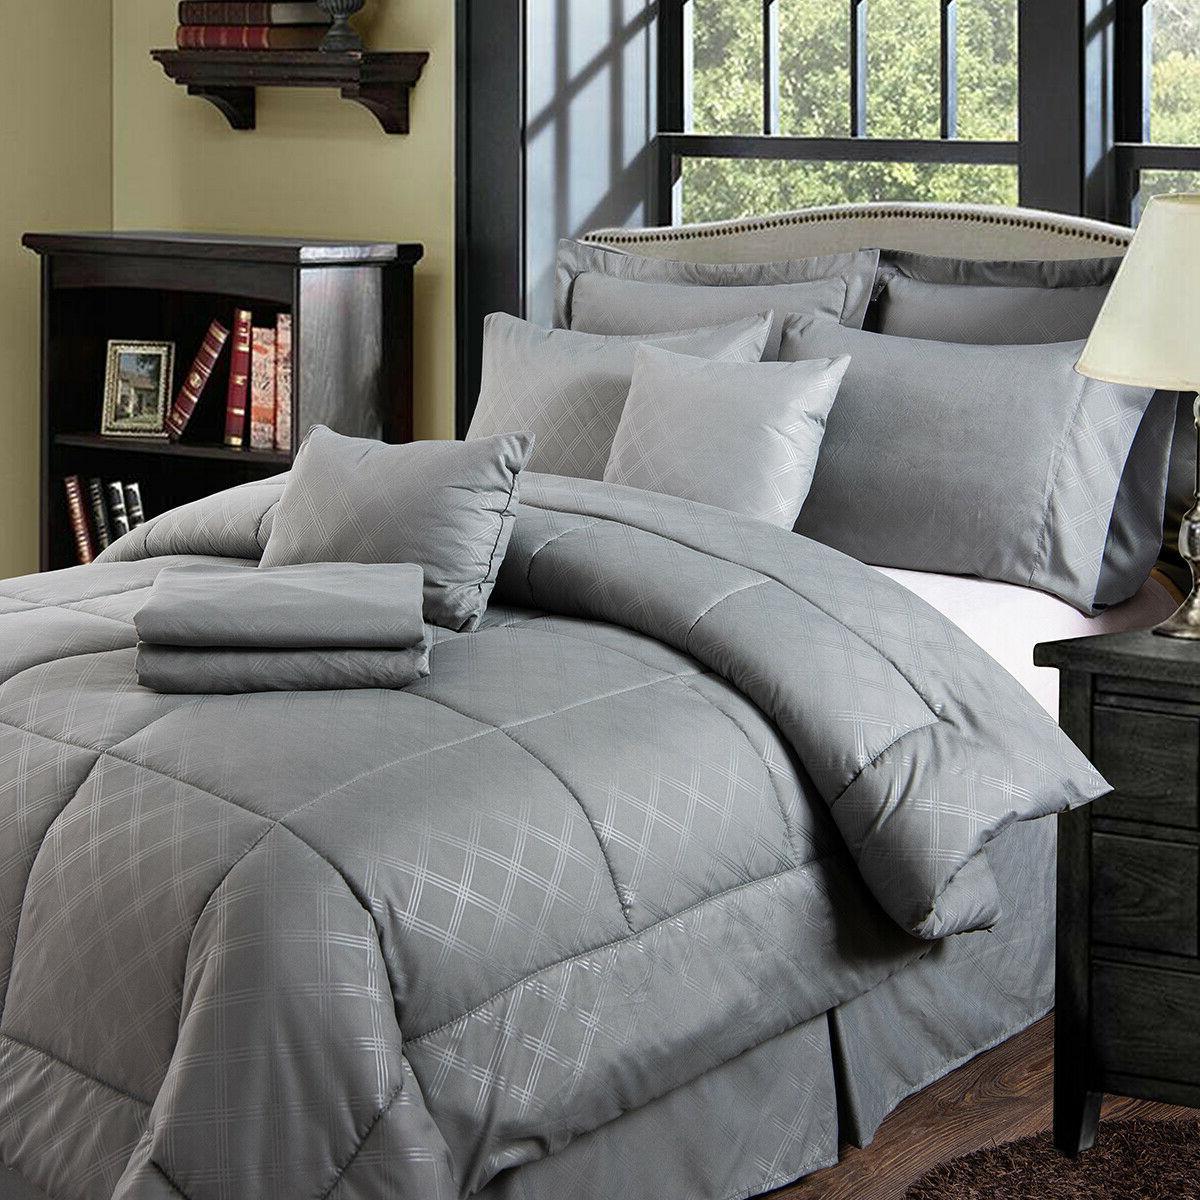 10-piece Solid Plaid Comforter Set